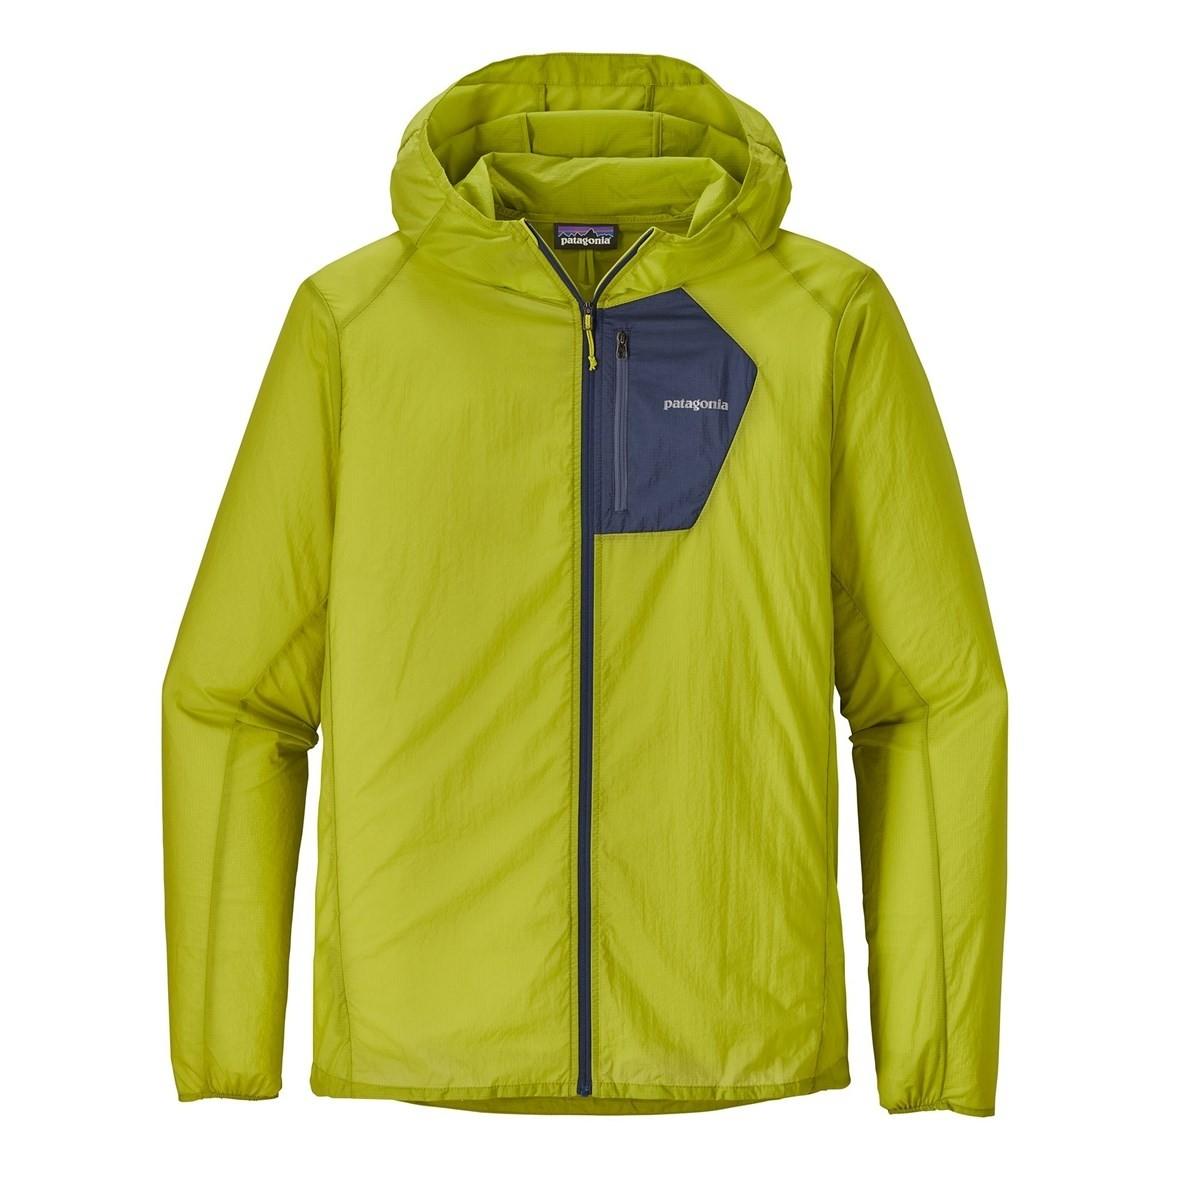 Patagonia Men's Houdini Jacket: Light Gecko green